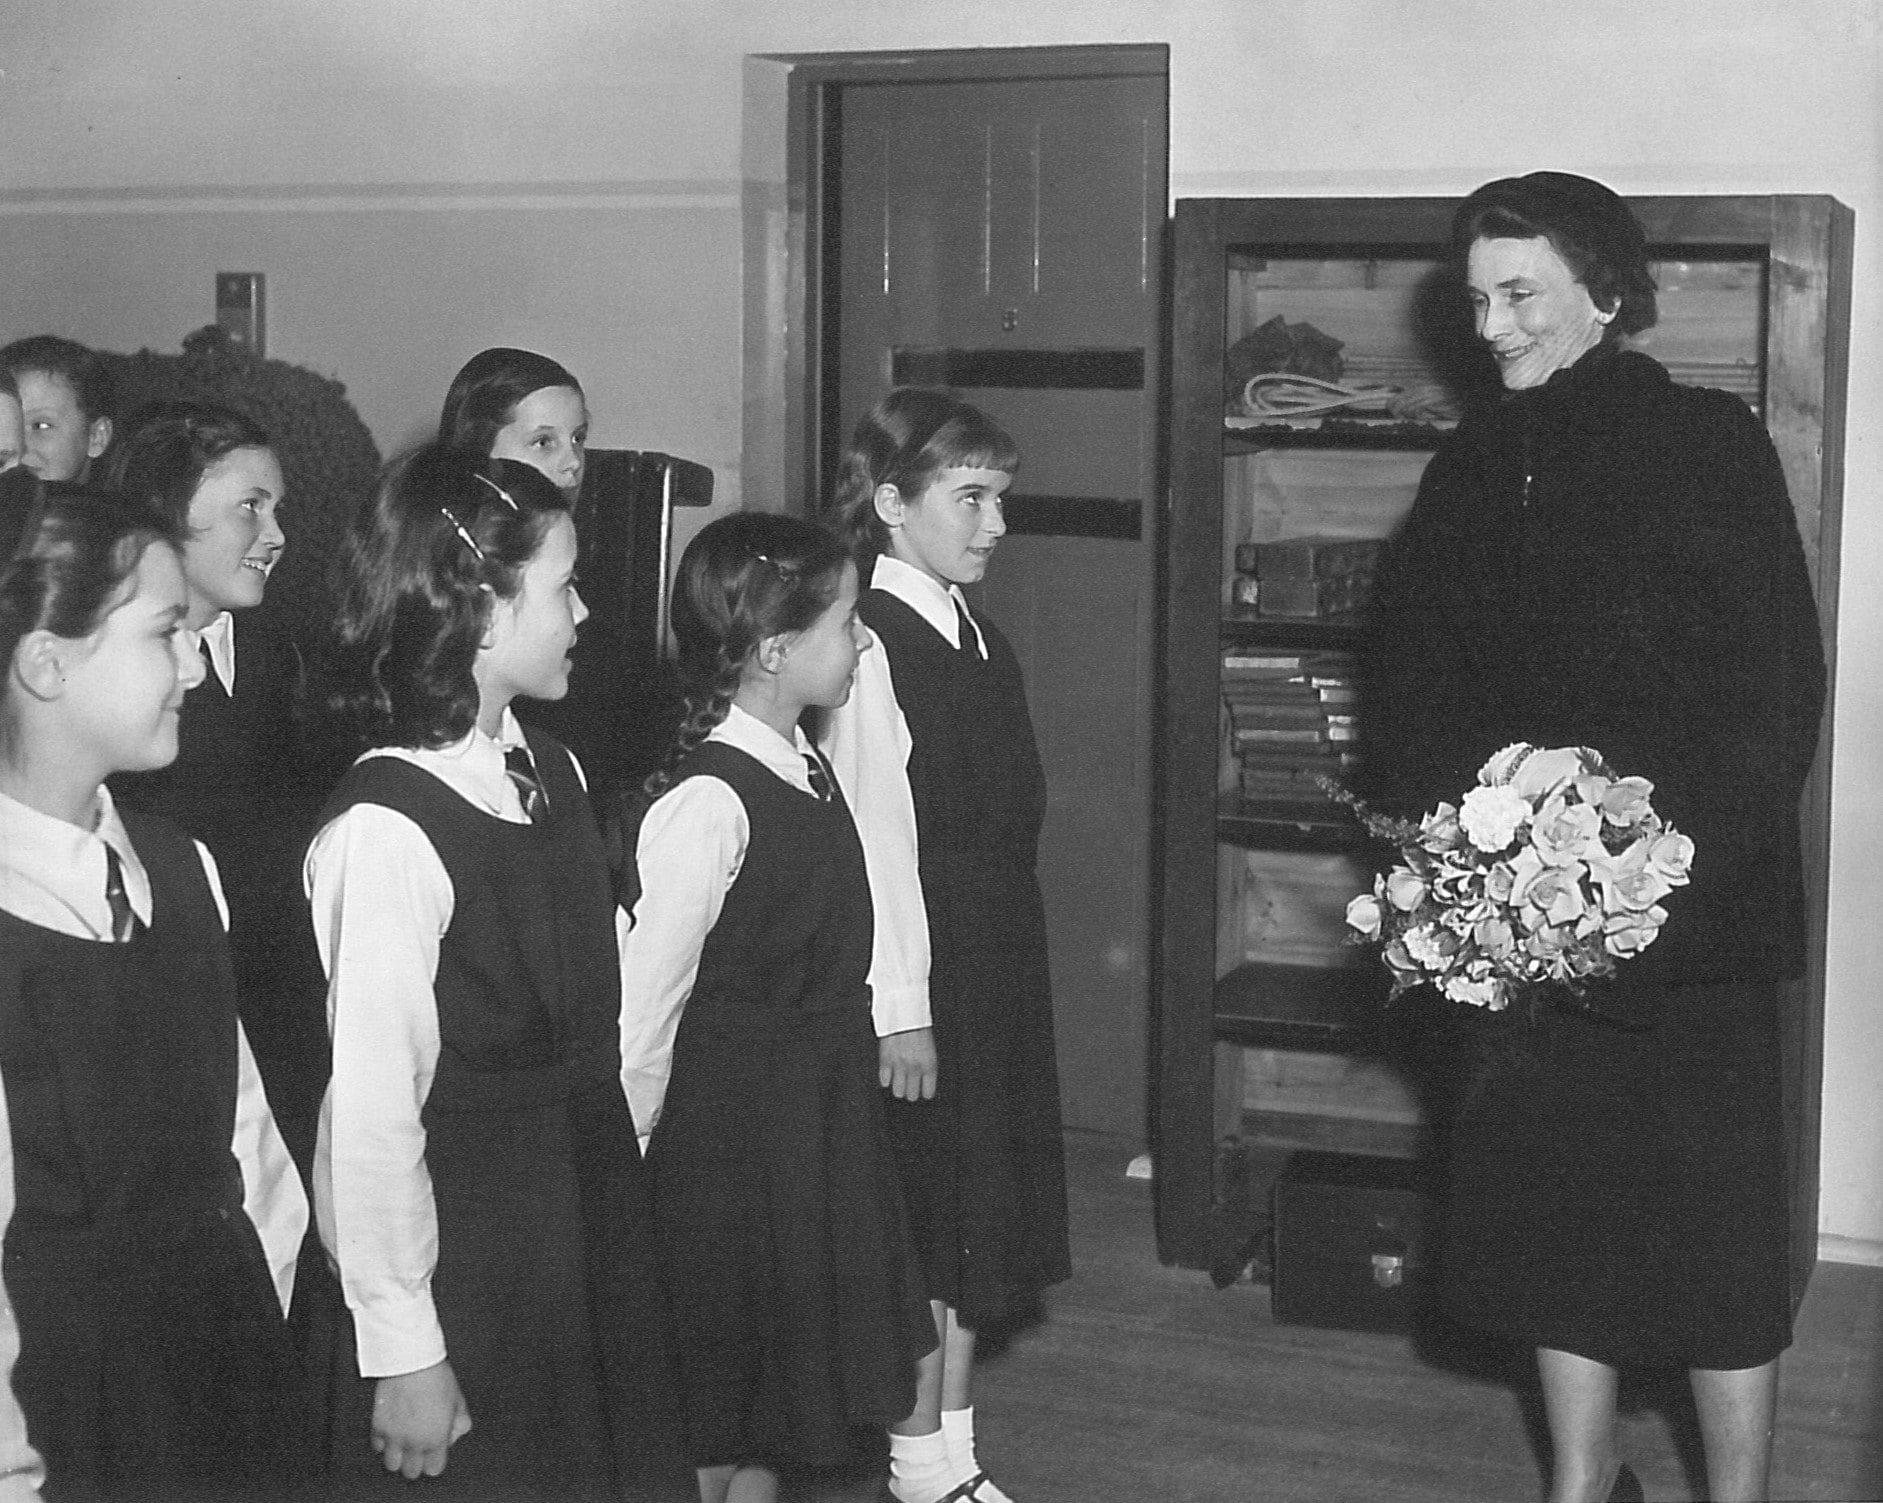 SCHS Royal Visit 1953